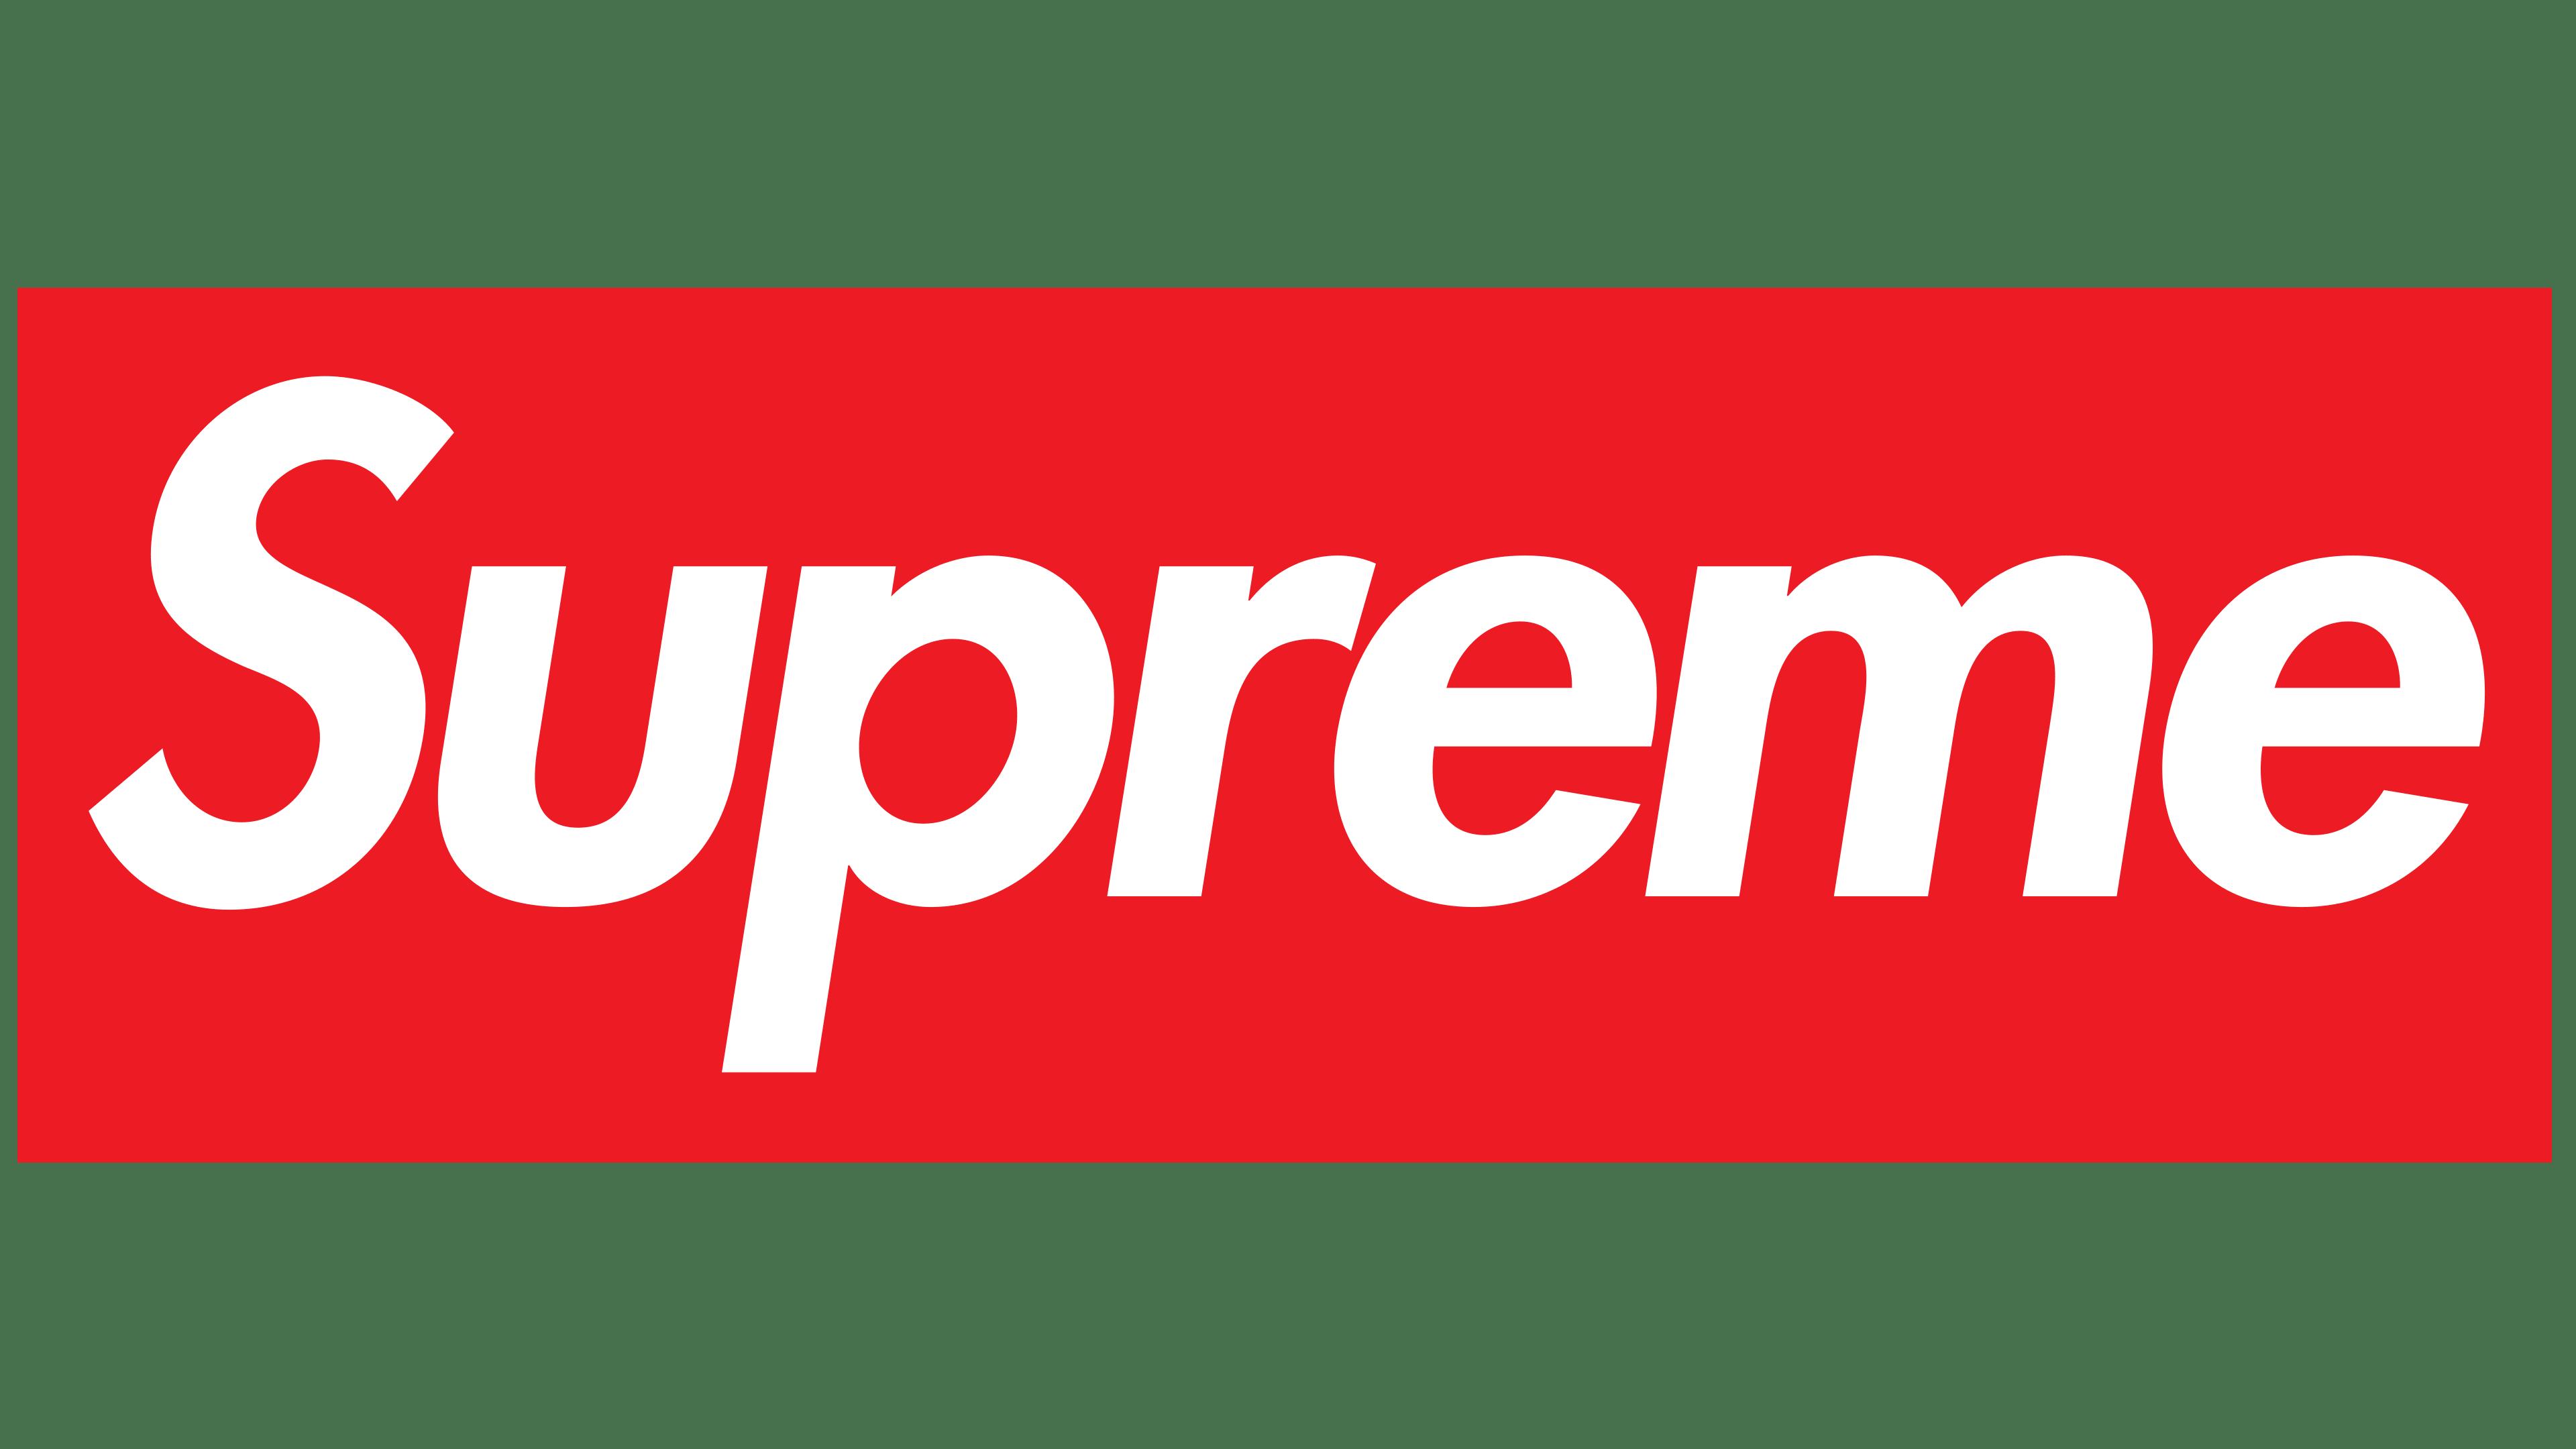 supreme-logo-png